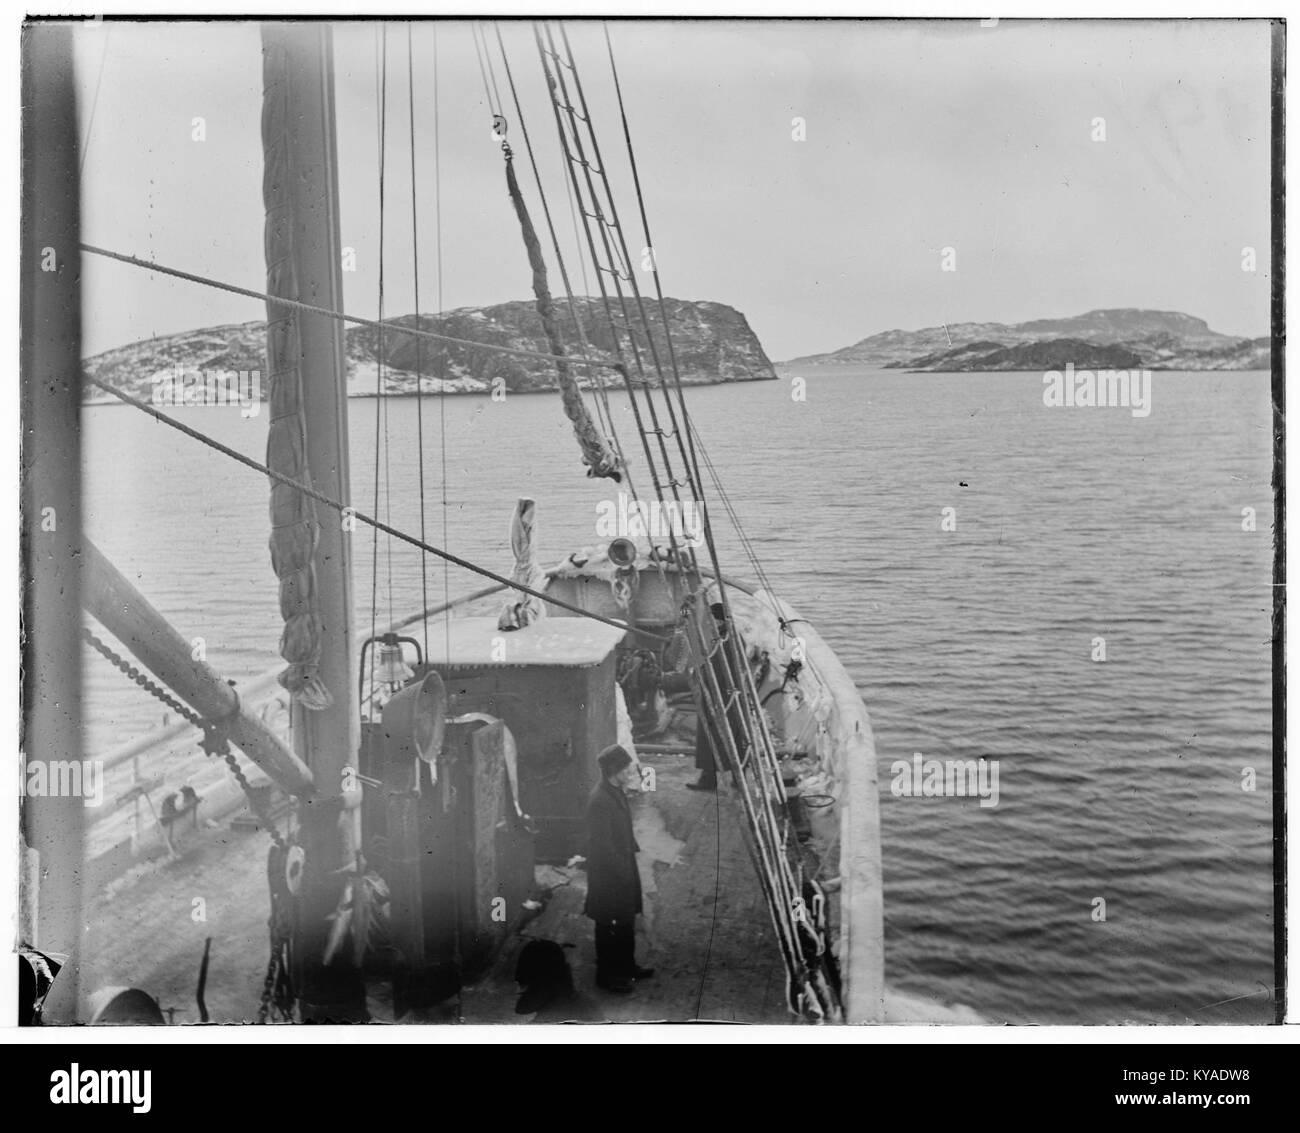 Stoksund, Sør Trondhjems amt - fo30141512150008 - Stock Image